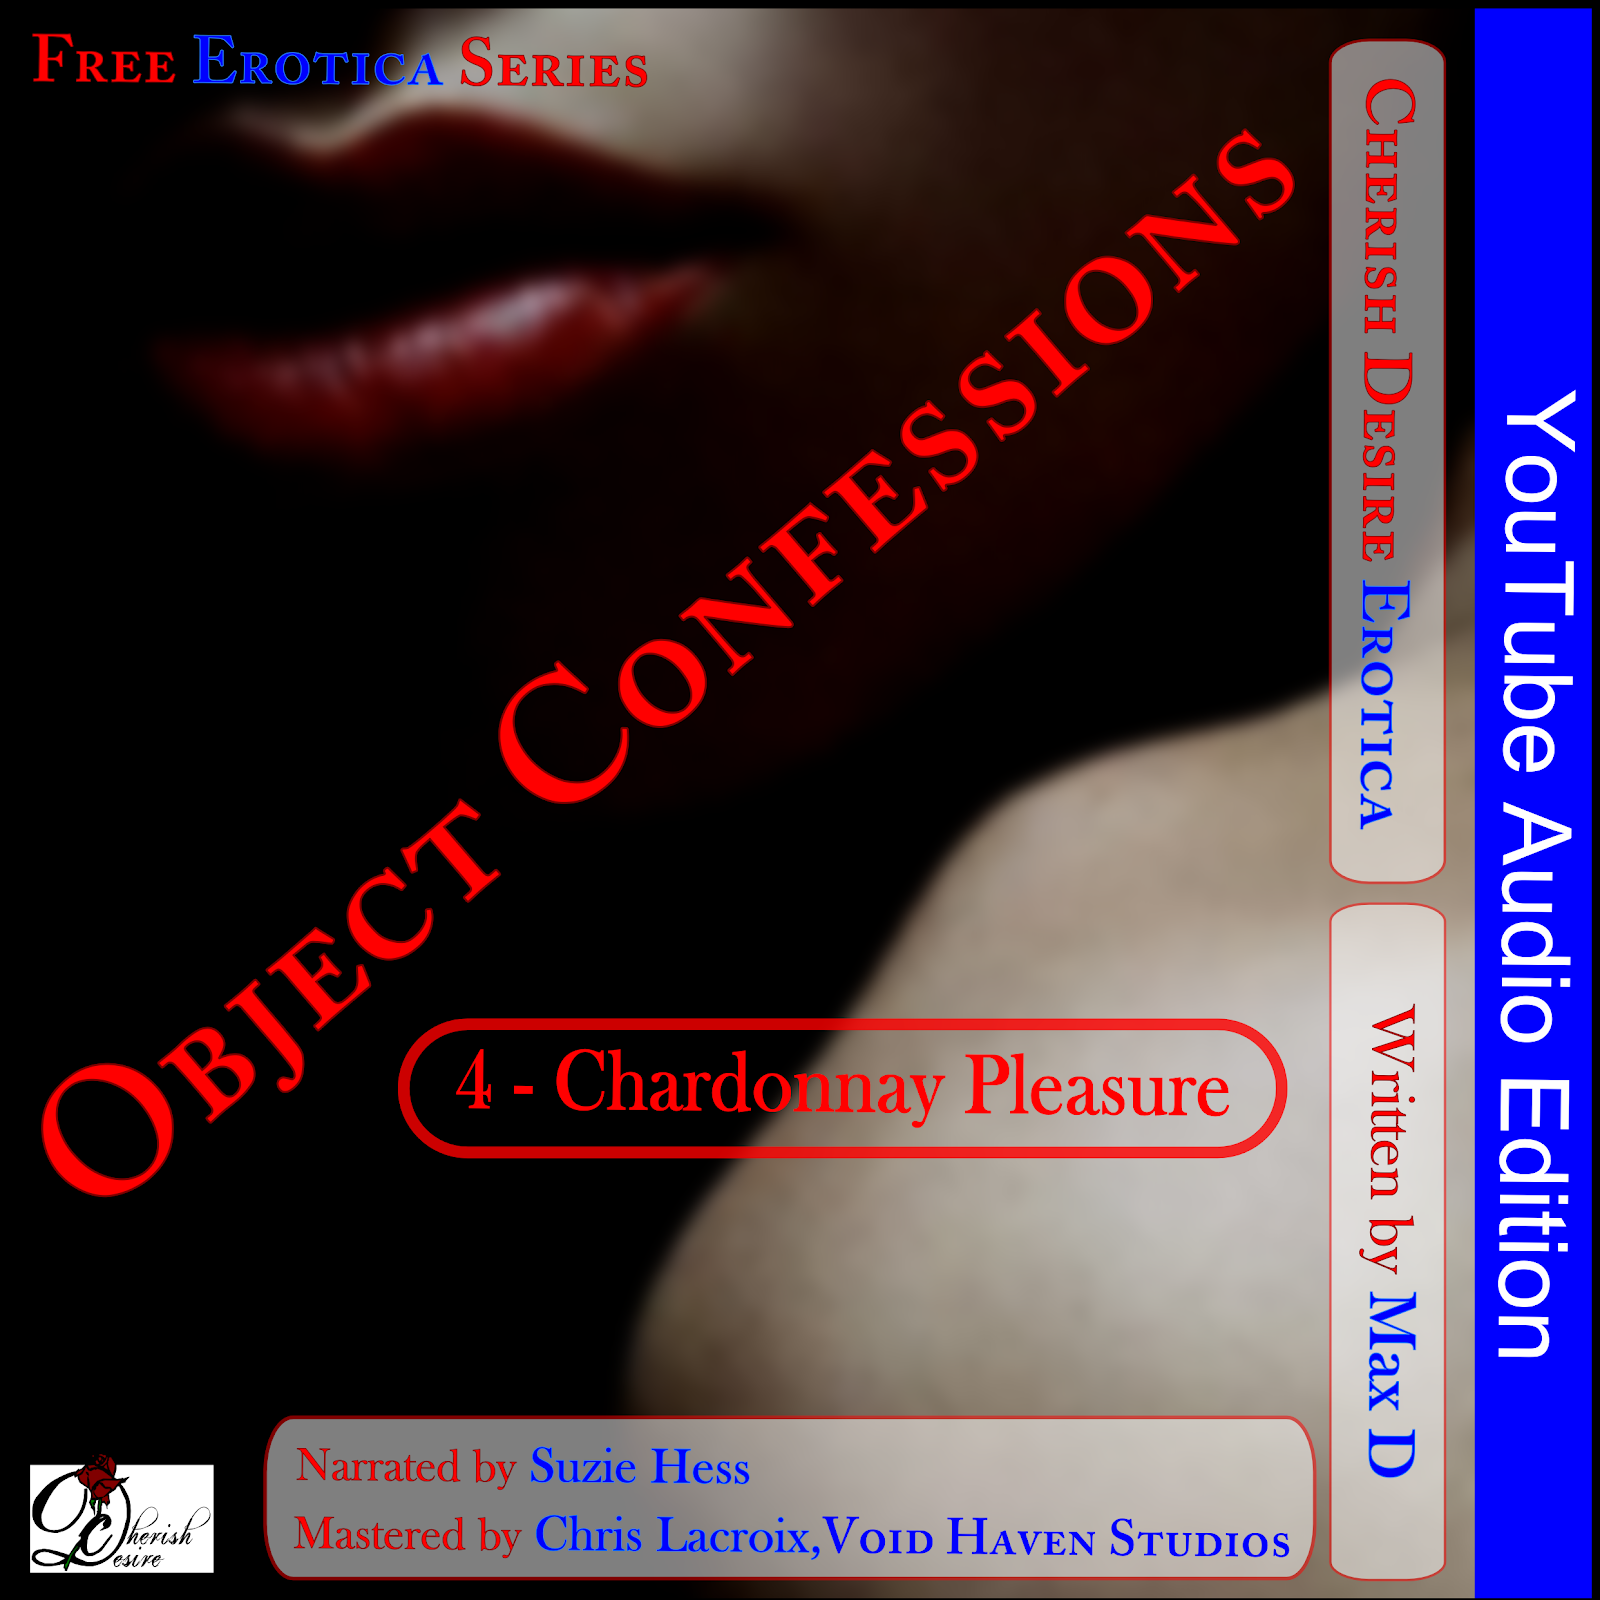 Cherish Desire: Very Dirty Stories YouTube Free Erotica Audio Series: Object Confessions 4: Chardonnay Pleasure, Max D, erotica